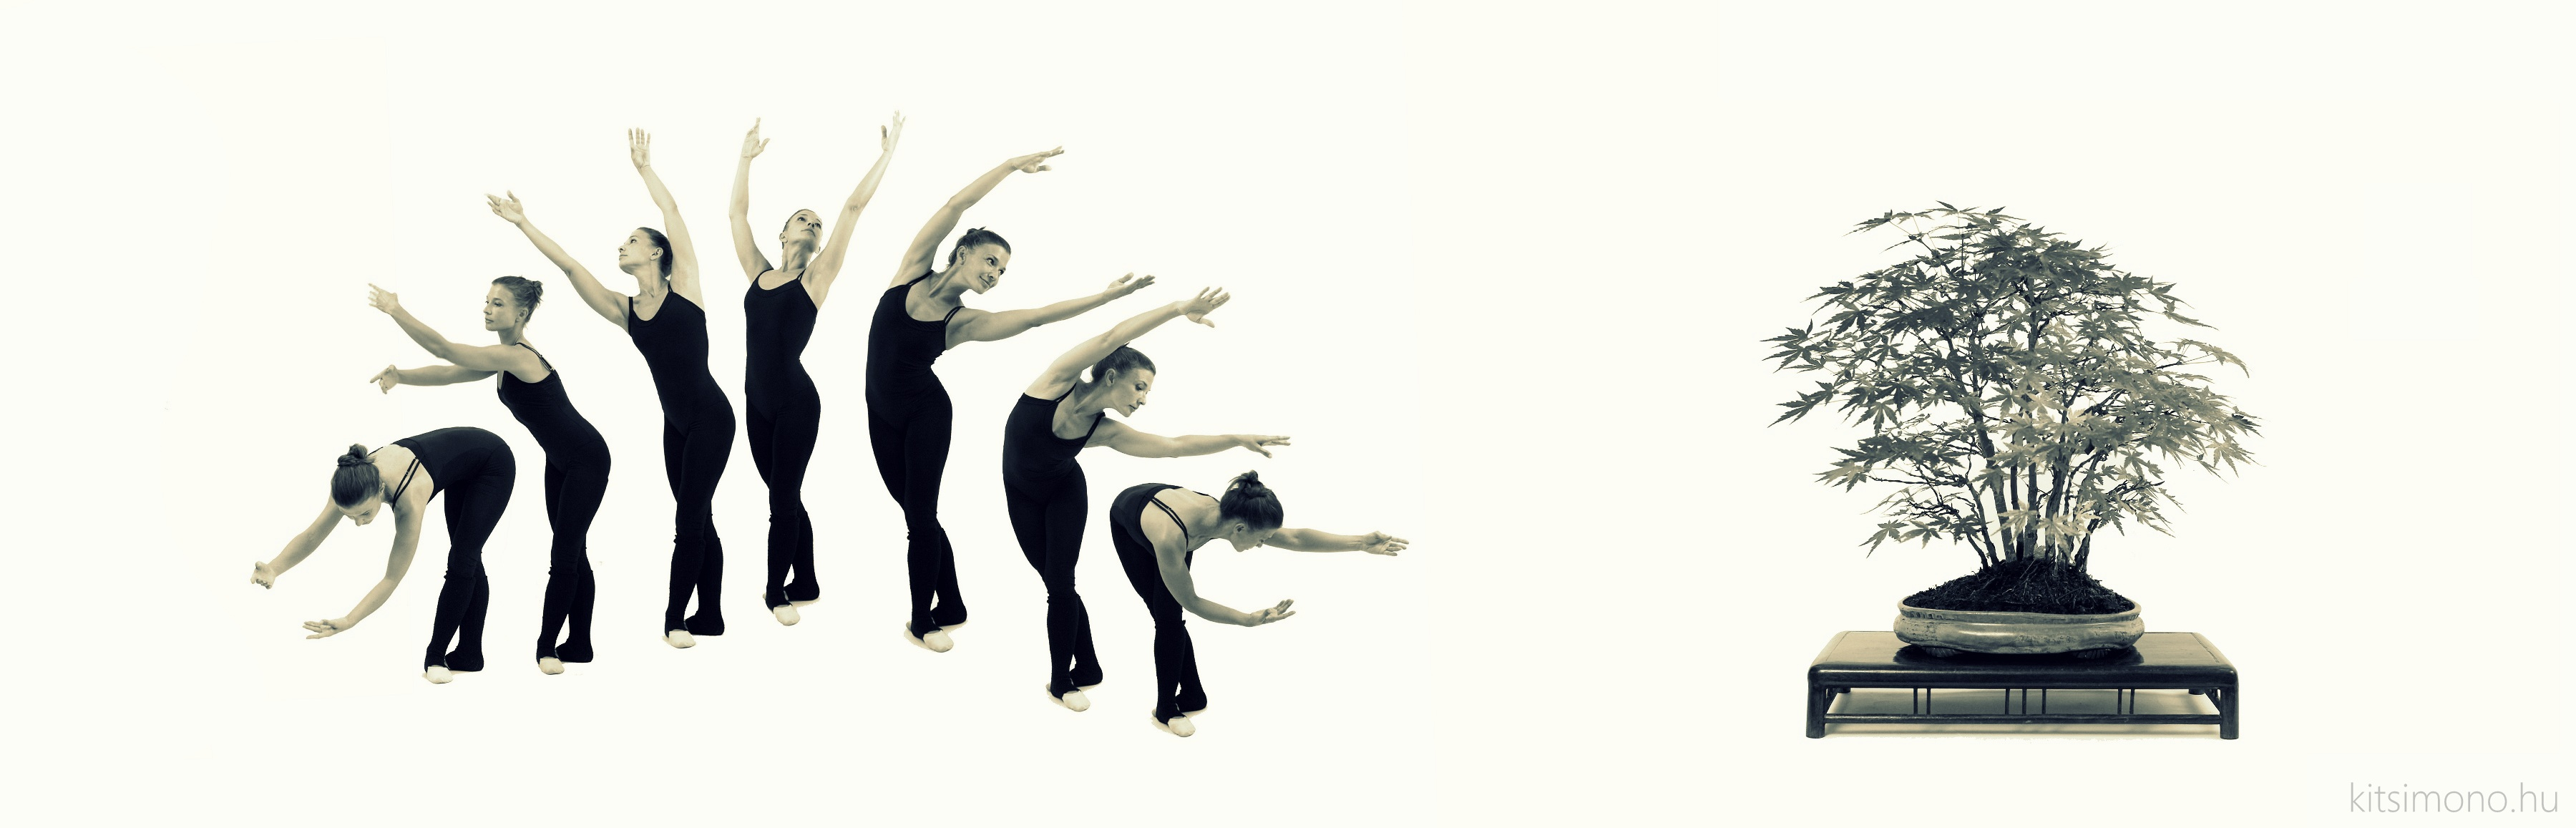 acer palmatum momiji japan juhar bonsai tell with ballet dance balet figures kitsimono (3) másolata